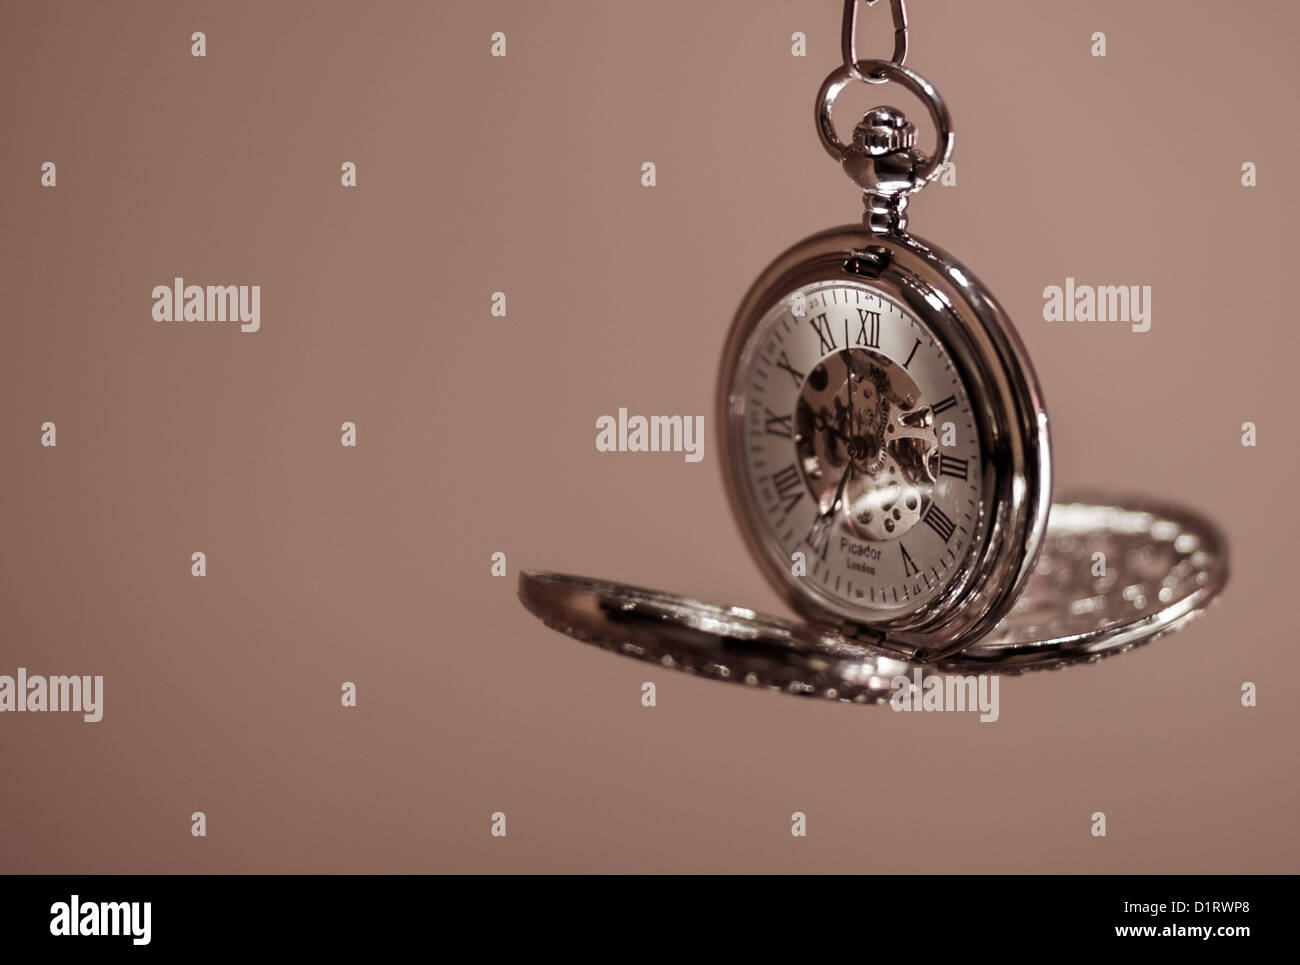 A handwound clockwork pocket, or fob, watch. - Stock Image